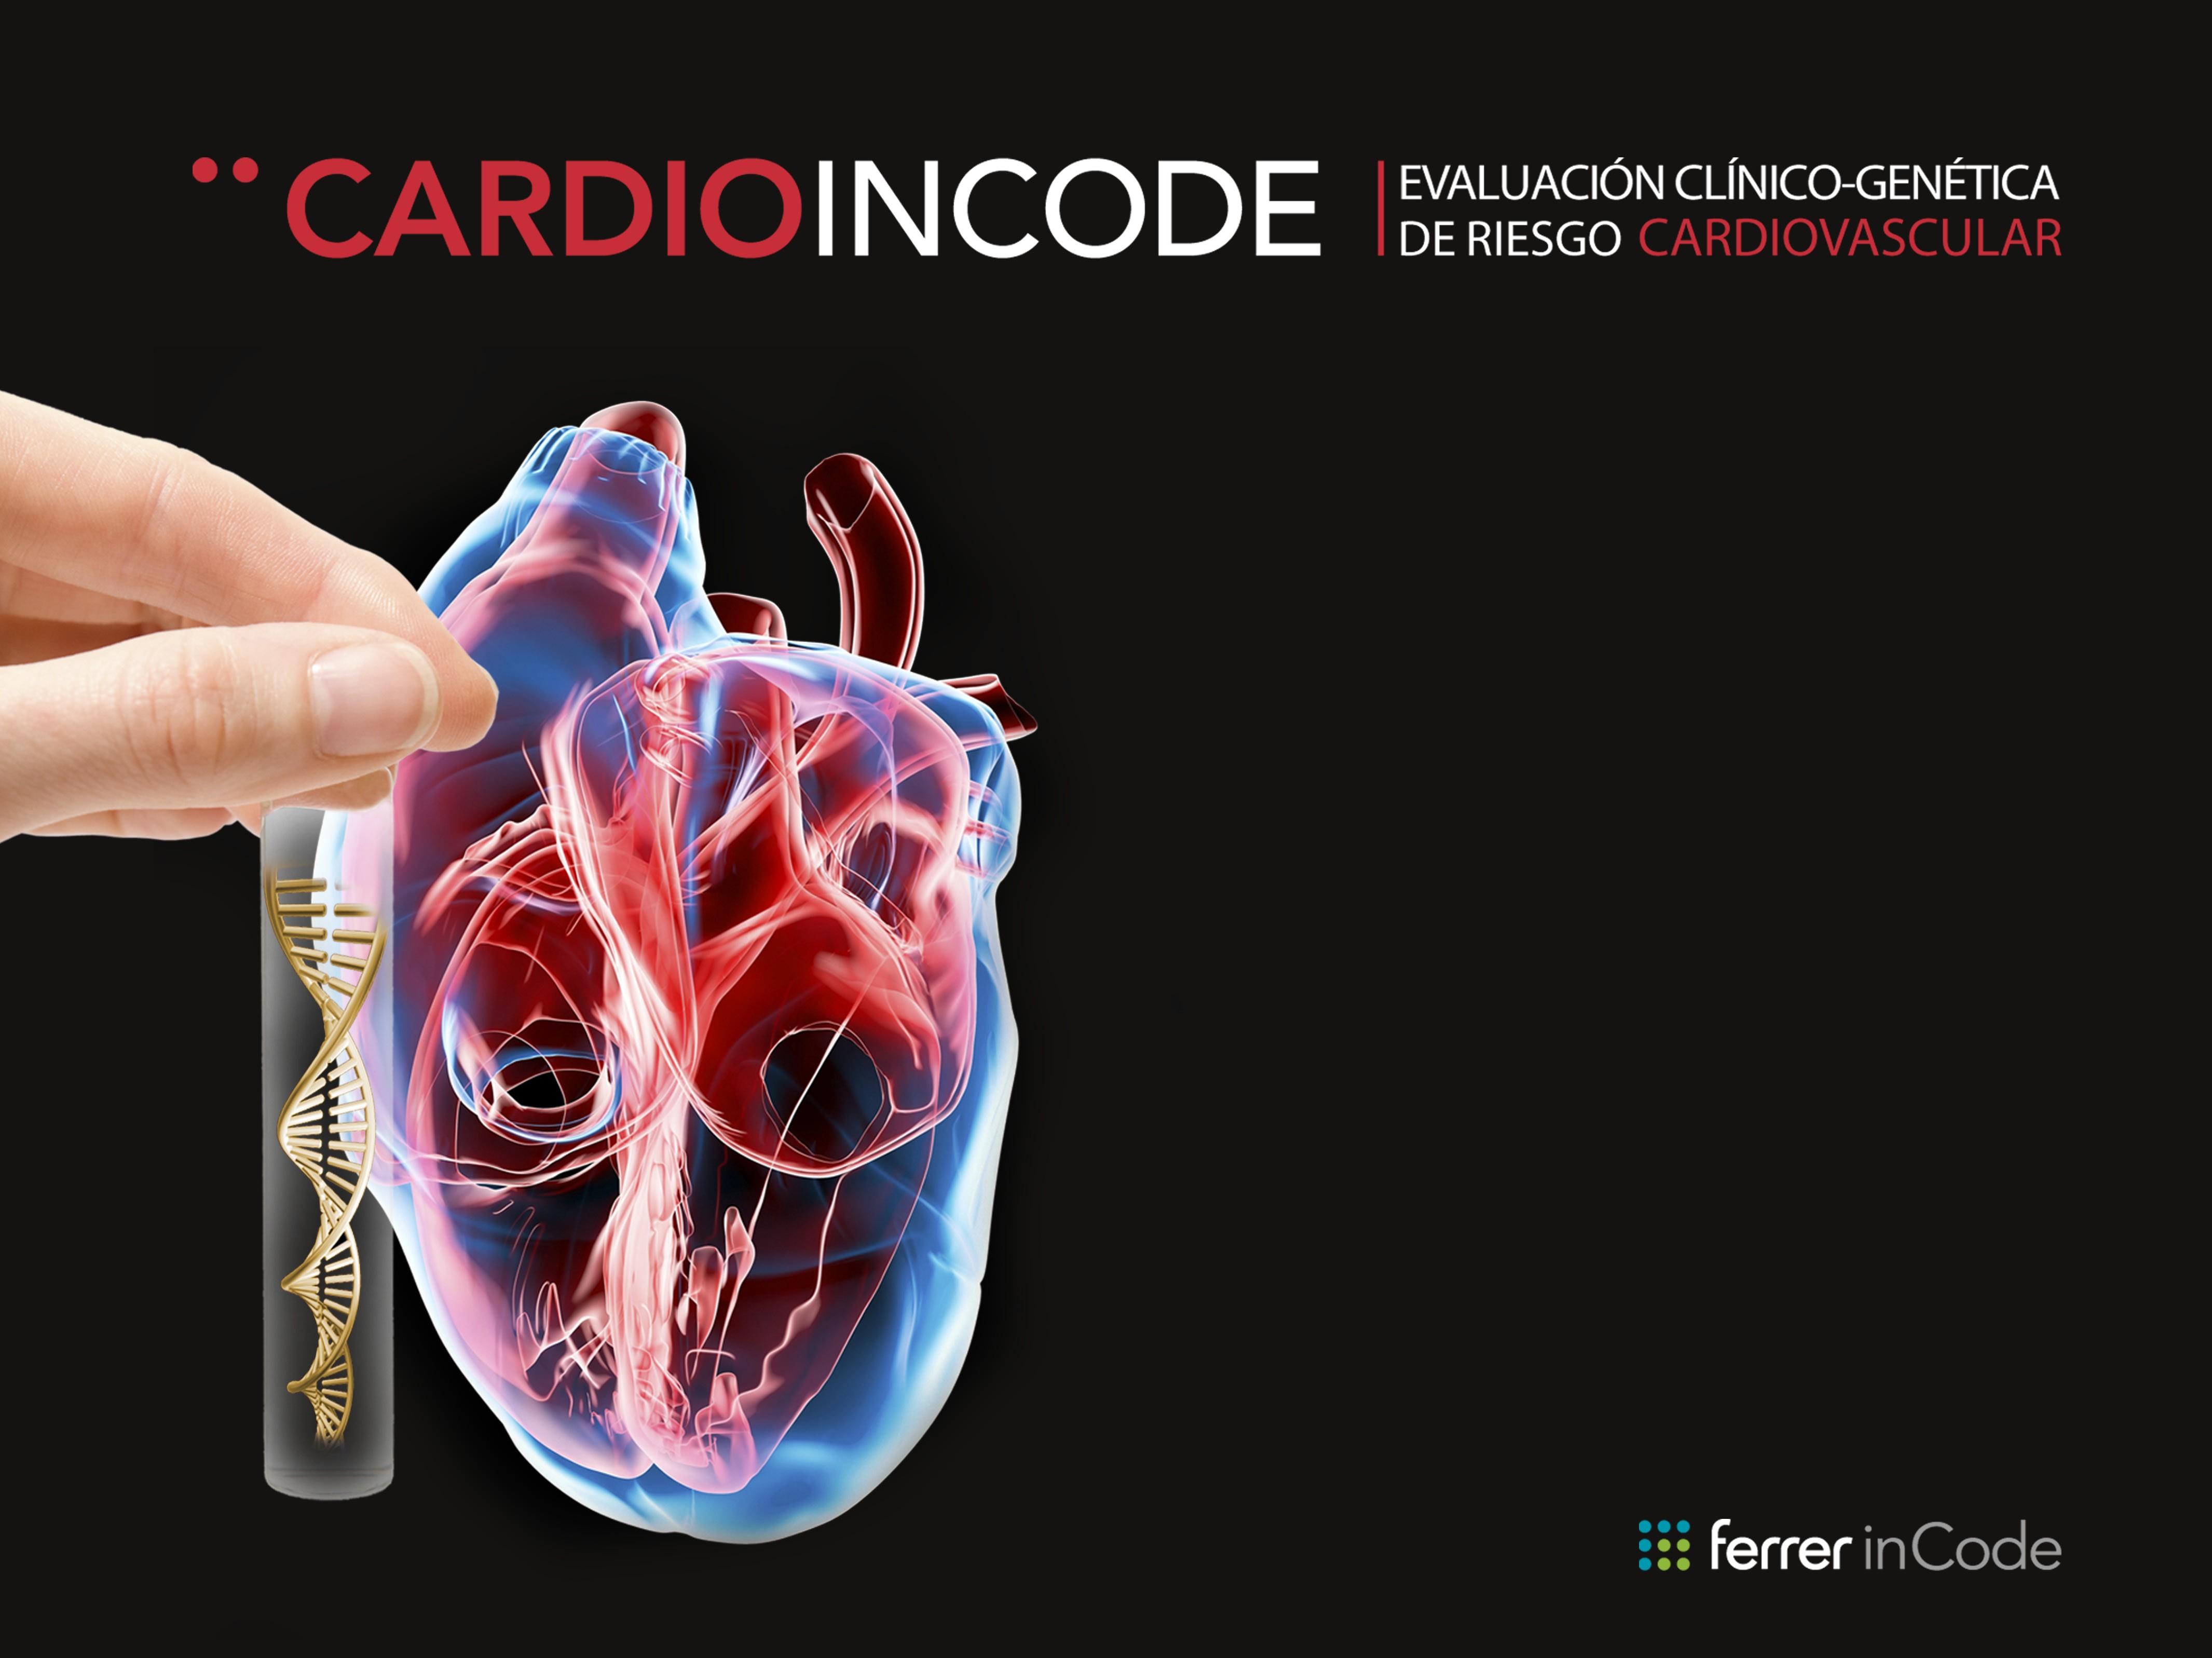 Cardio inCode